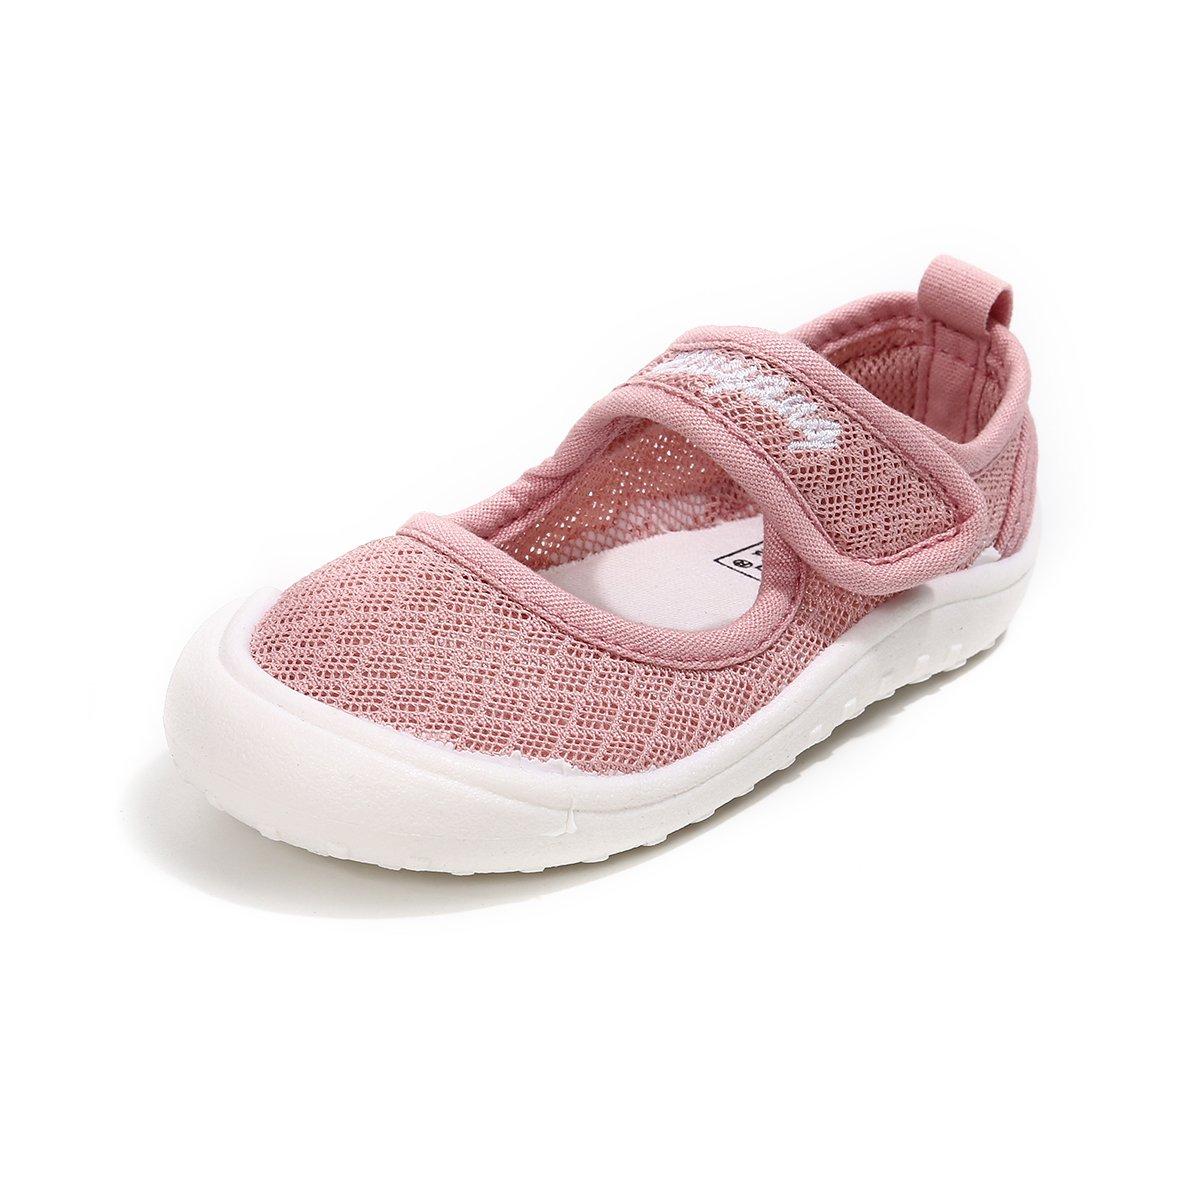 BENHERO Toddler Girls Summer Shoes Slip-on Casual Breathable Mesh Mary Jane Flat Sneaker(9.5 M US Toddler,Pink)